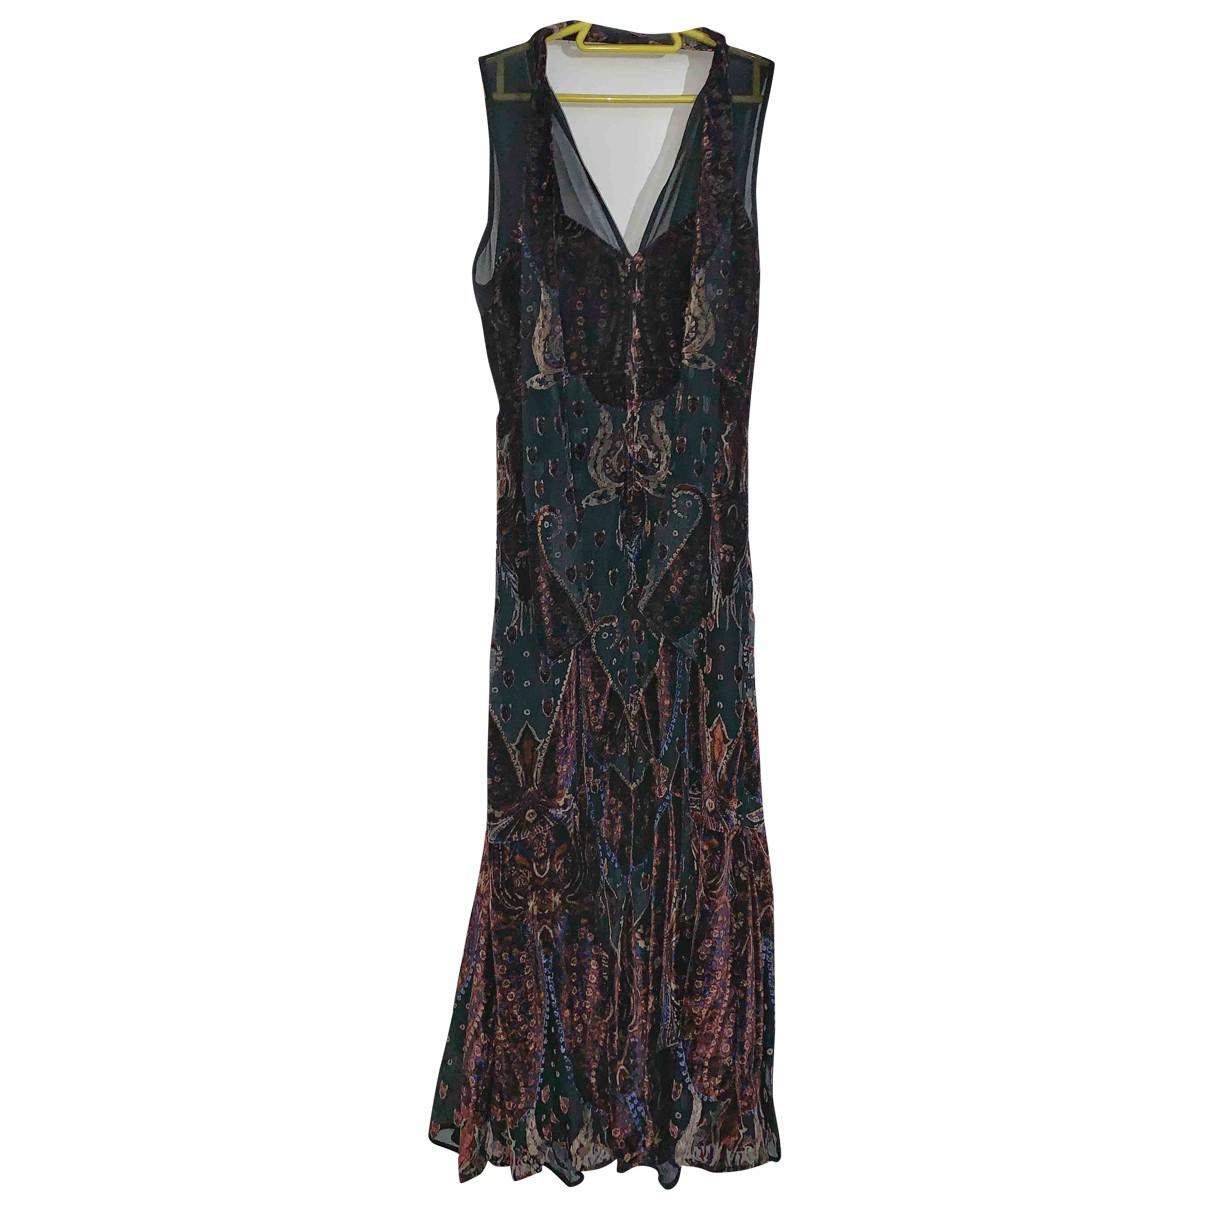 Free People \N Black dress for Women 38 FR